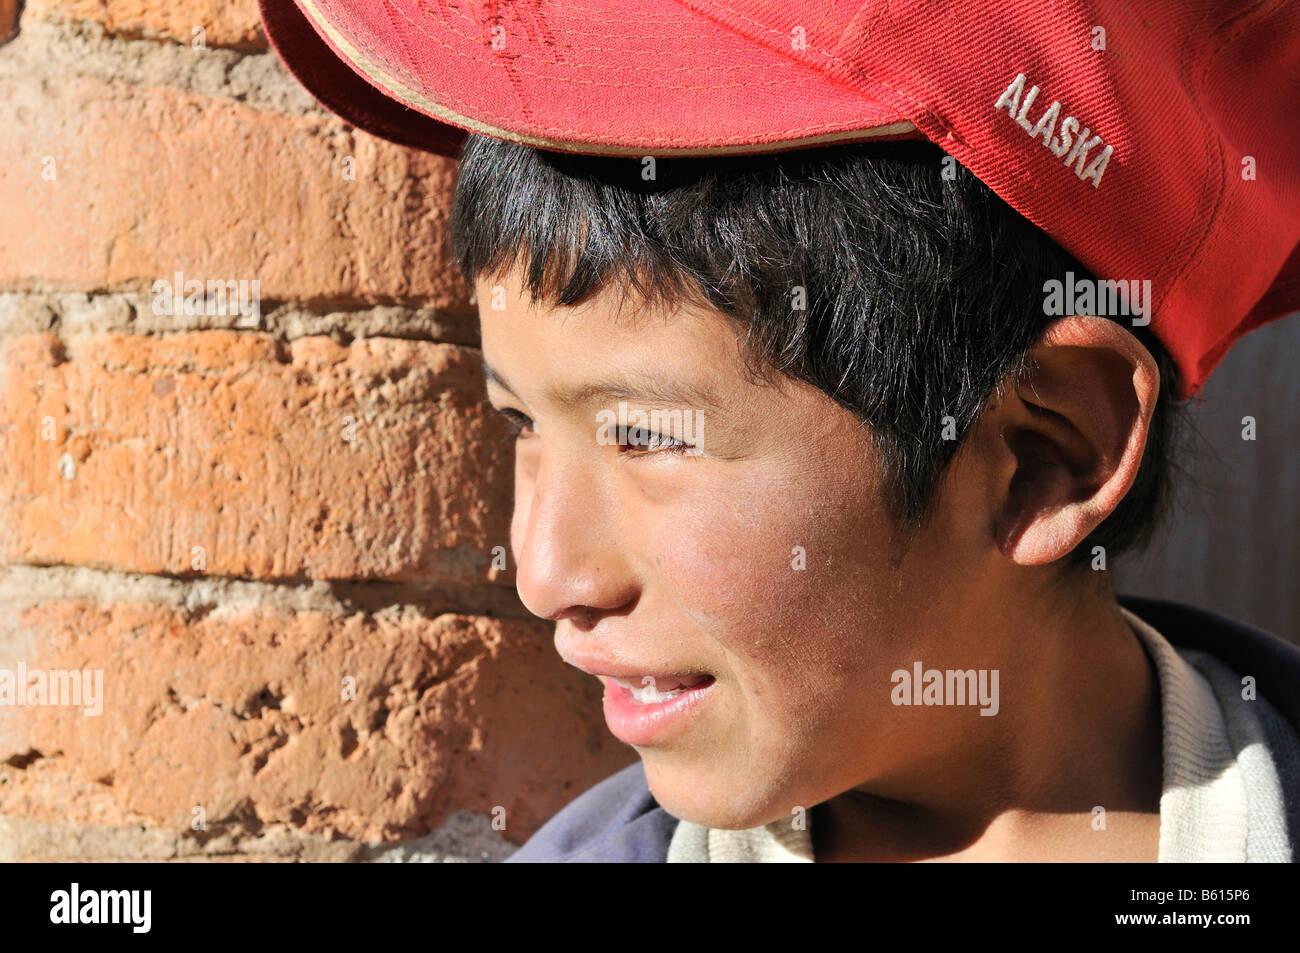 Boy looking round the corner of a wall, Llallagua, Potosi, Bolivia, South America - Stock Image